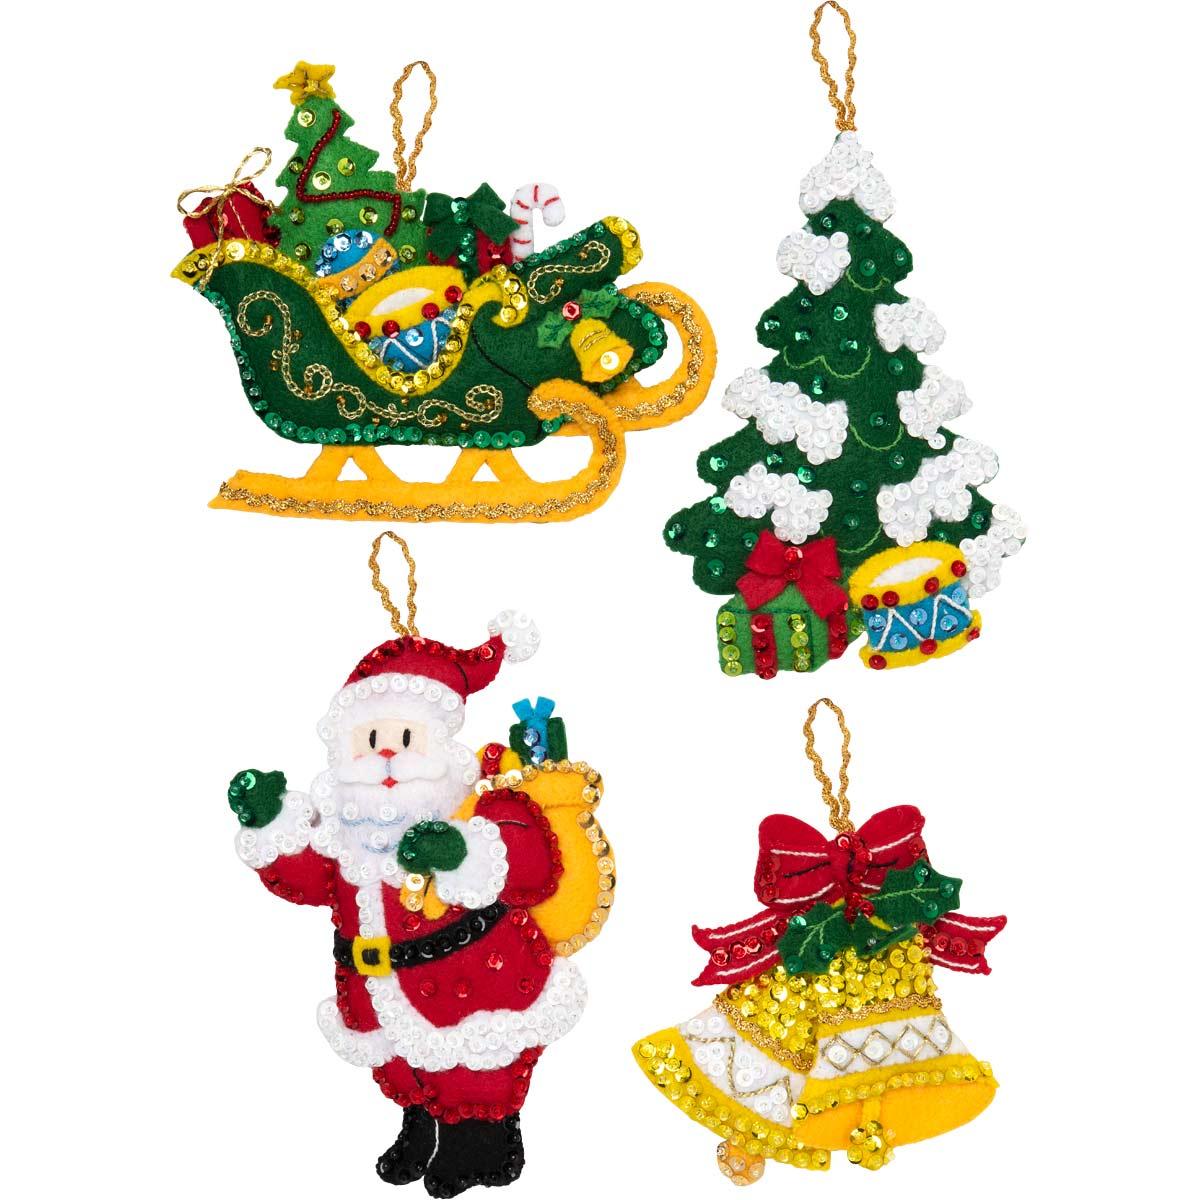 Bucilla ® Seasonal - Felt - Ornament Kits - Santa's Grand Sleigh - 89055E